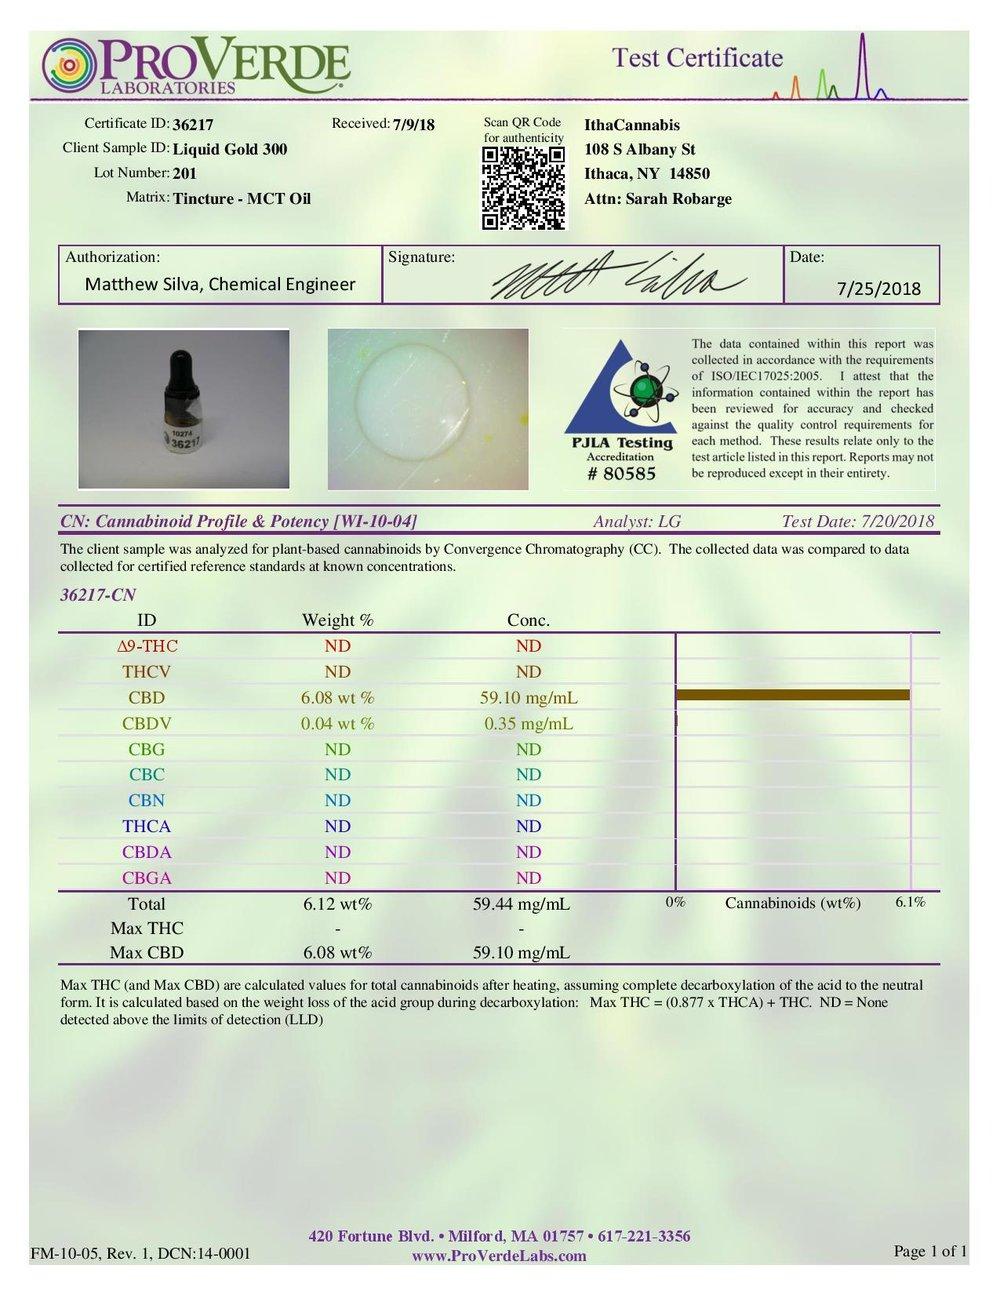 36217_CN_Liquid_Gold_300 (3)-page-001.jpg